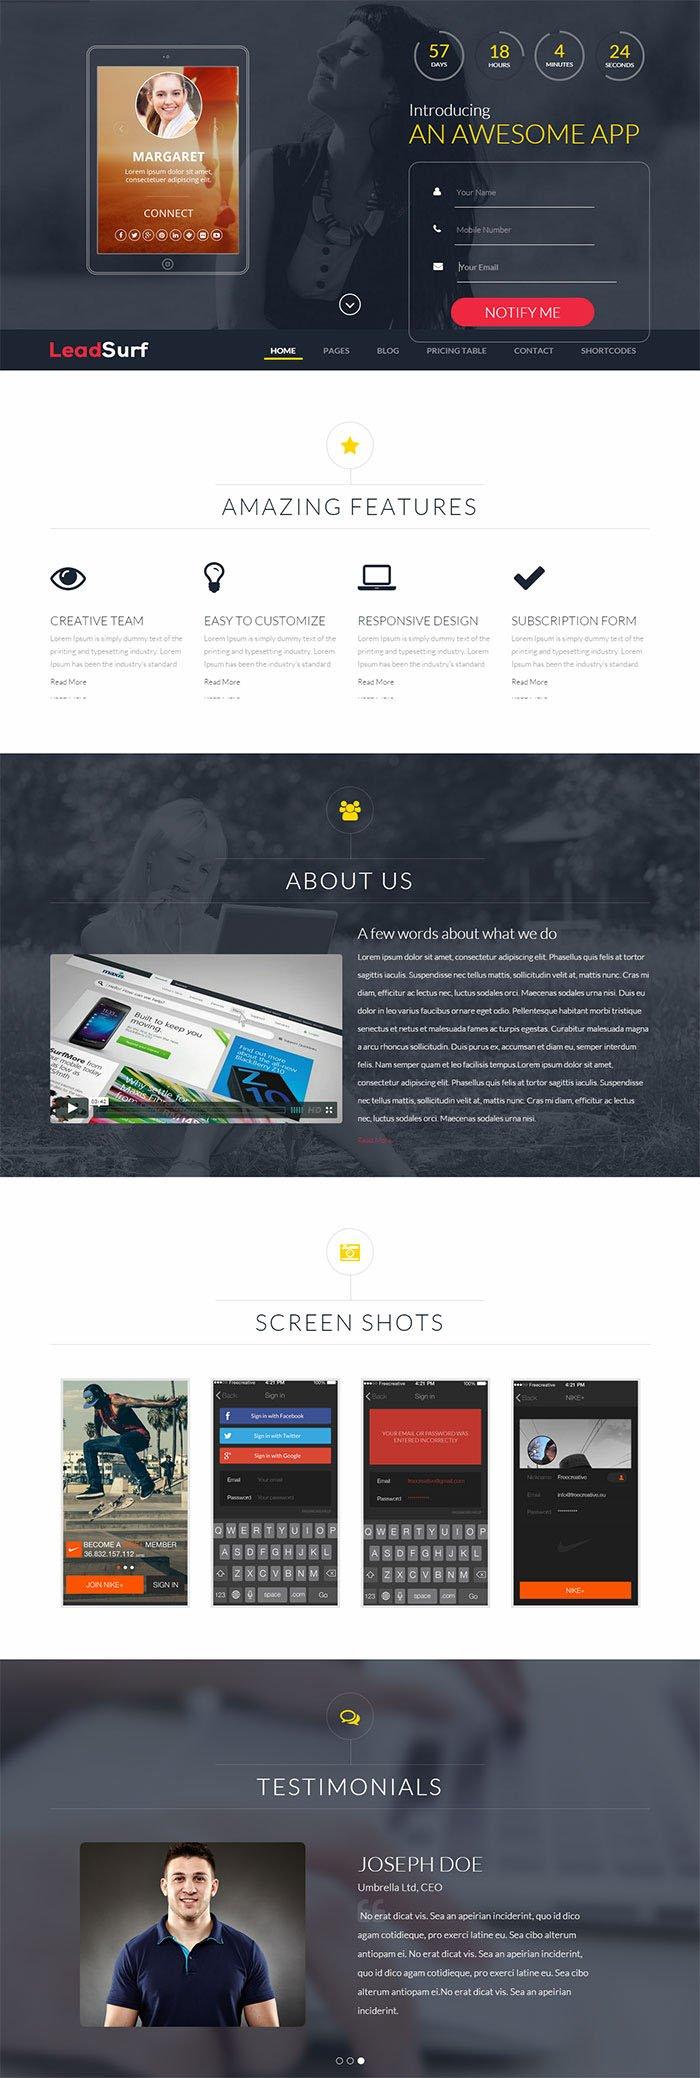 LeadSurf WordPress Theme